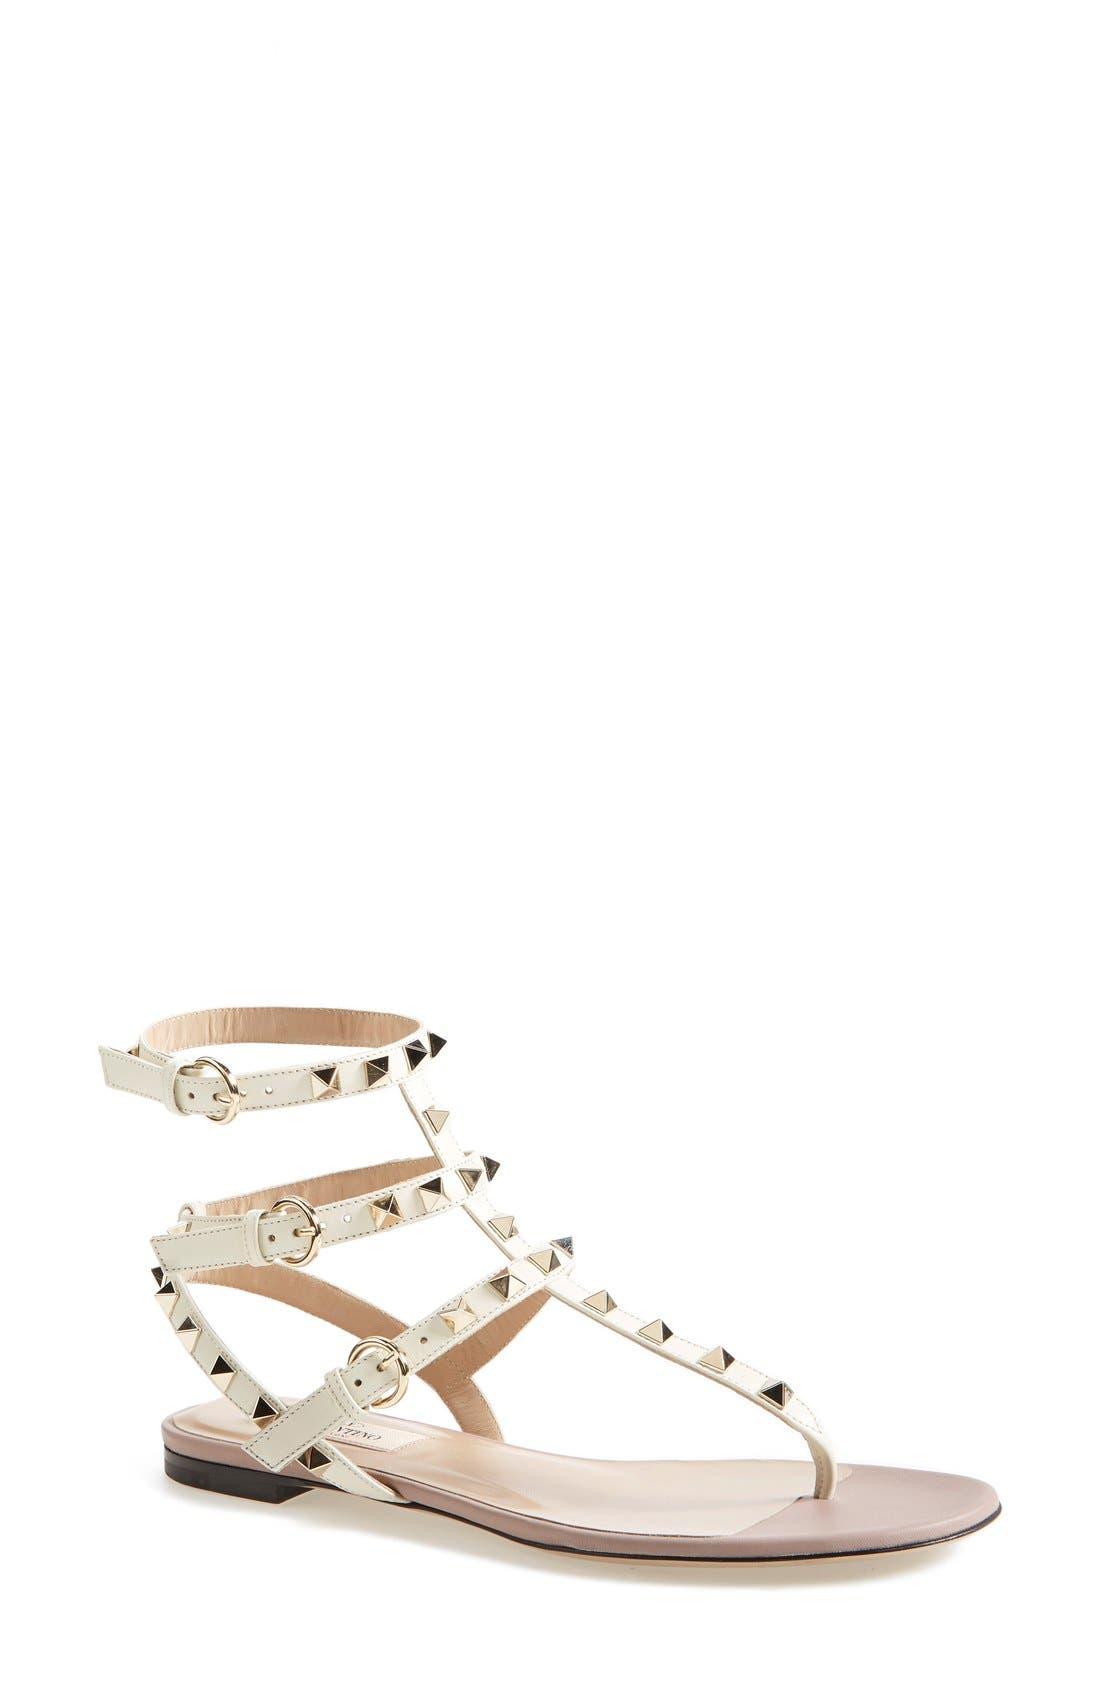 'Rockstud' Leather Thong Sandal, Main, color, 900